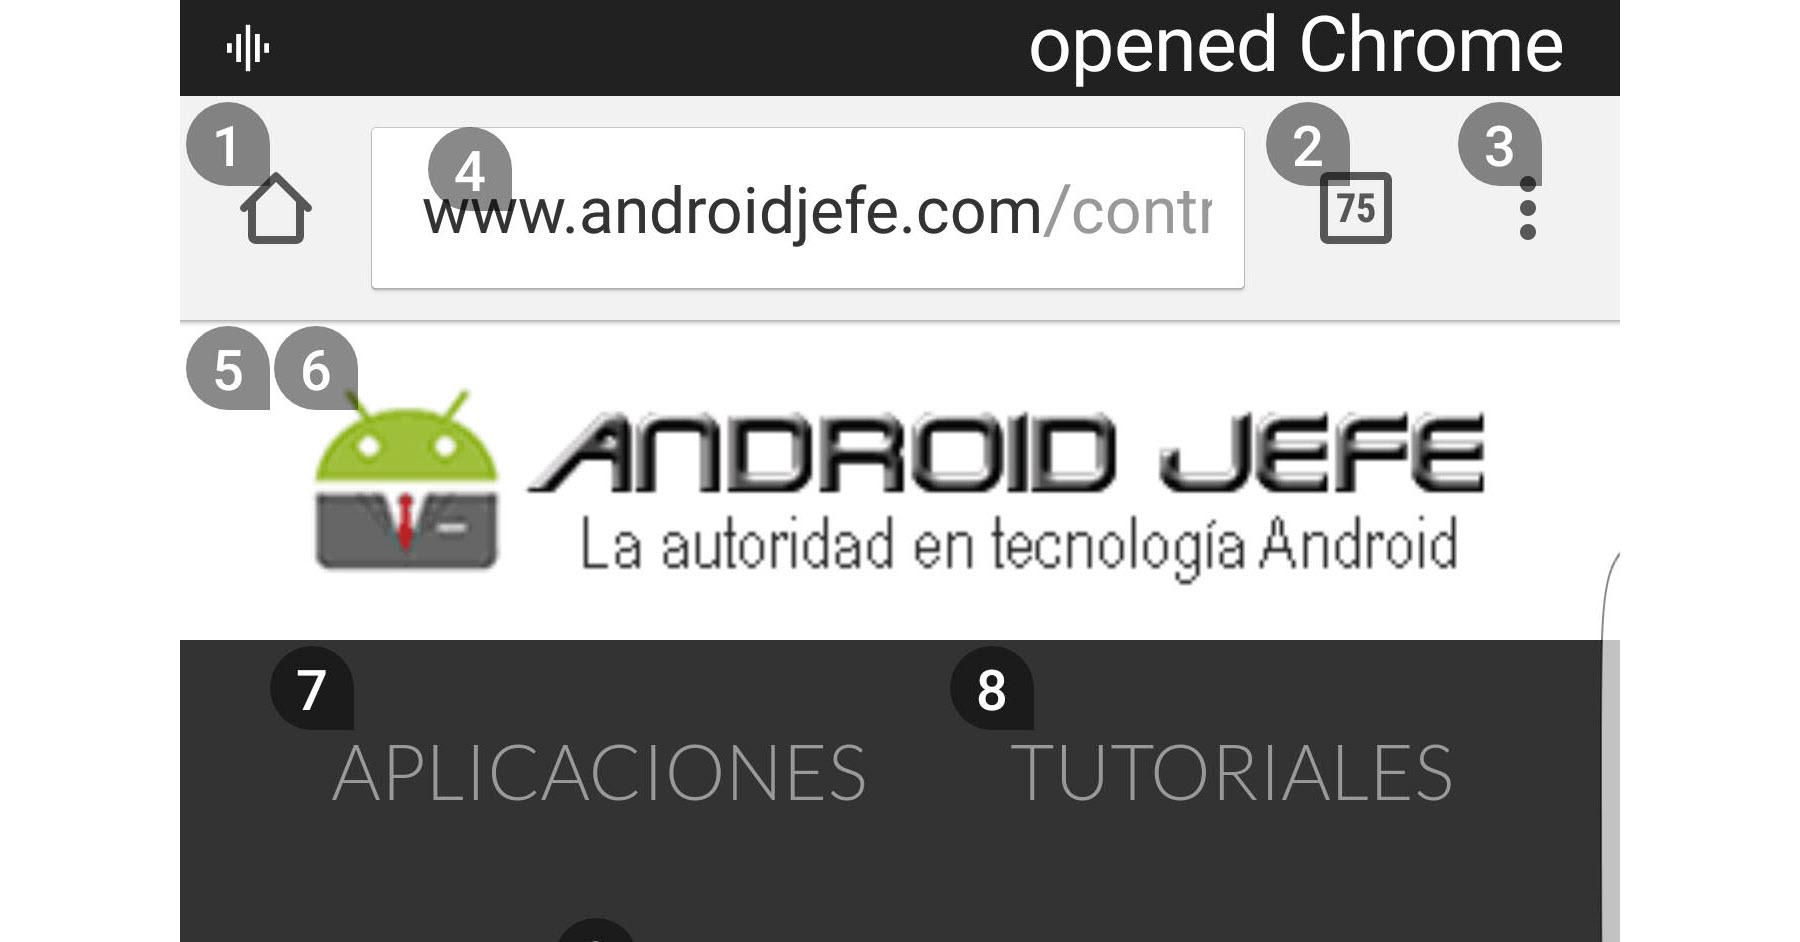 Cómo controlar tu celular Android con comandos de VOZ